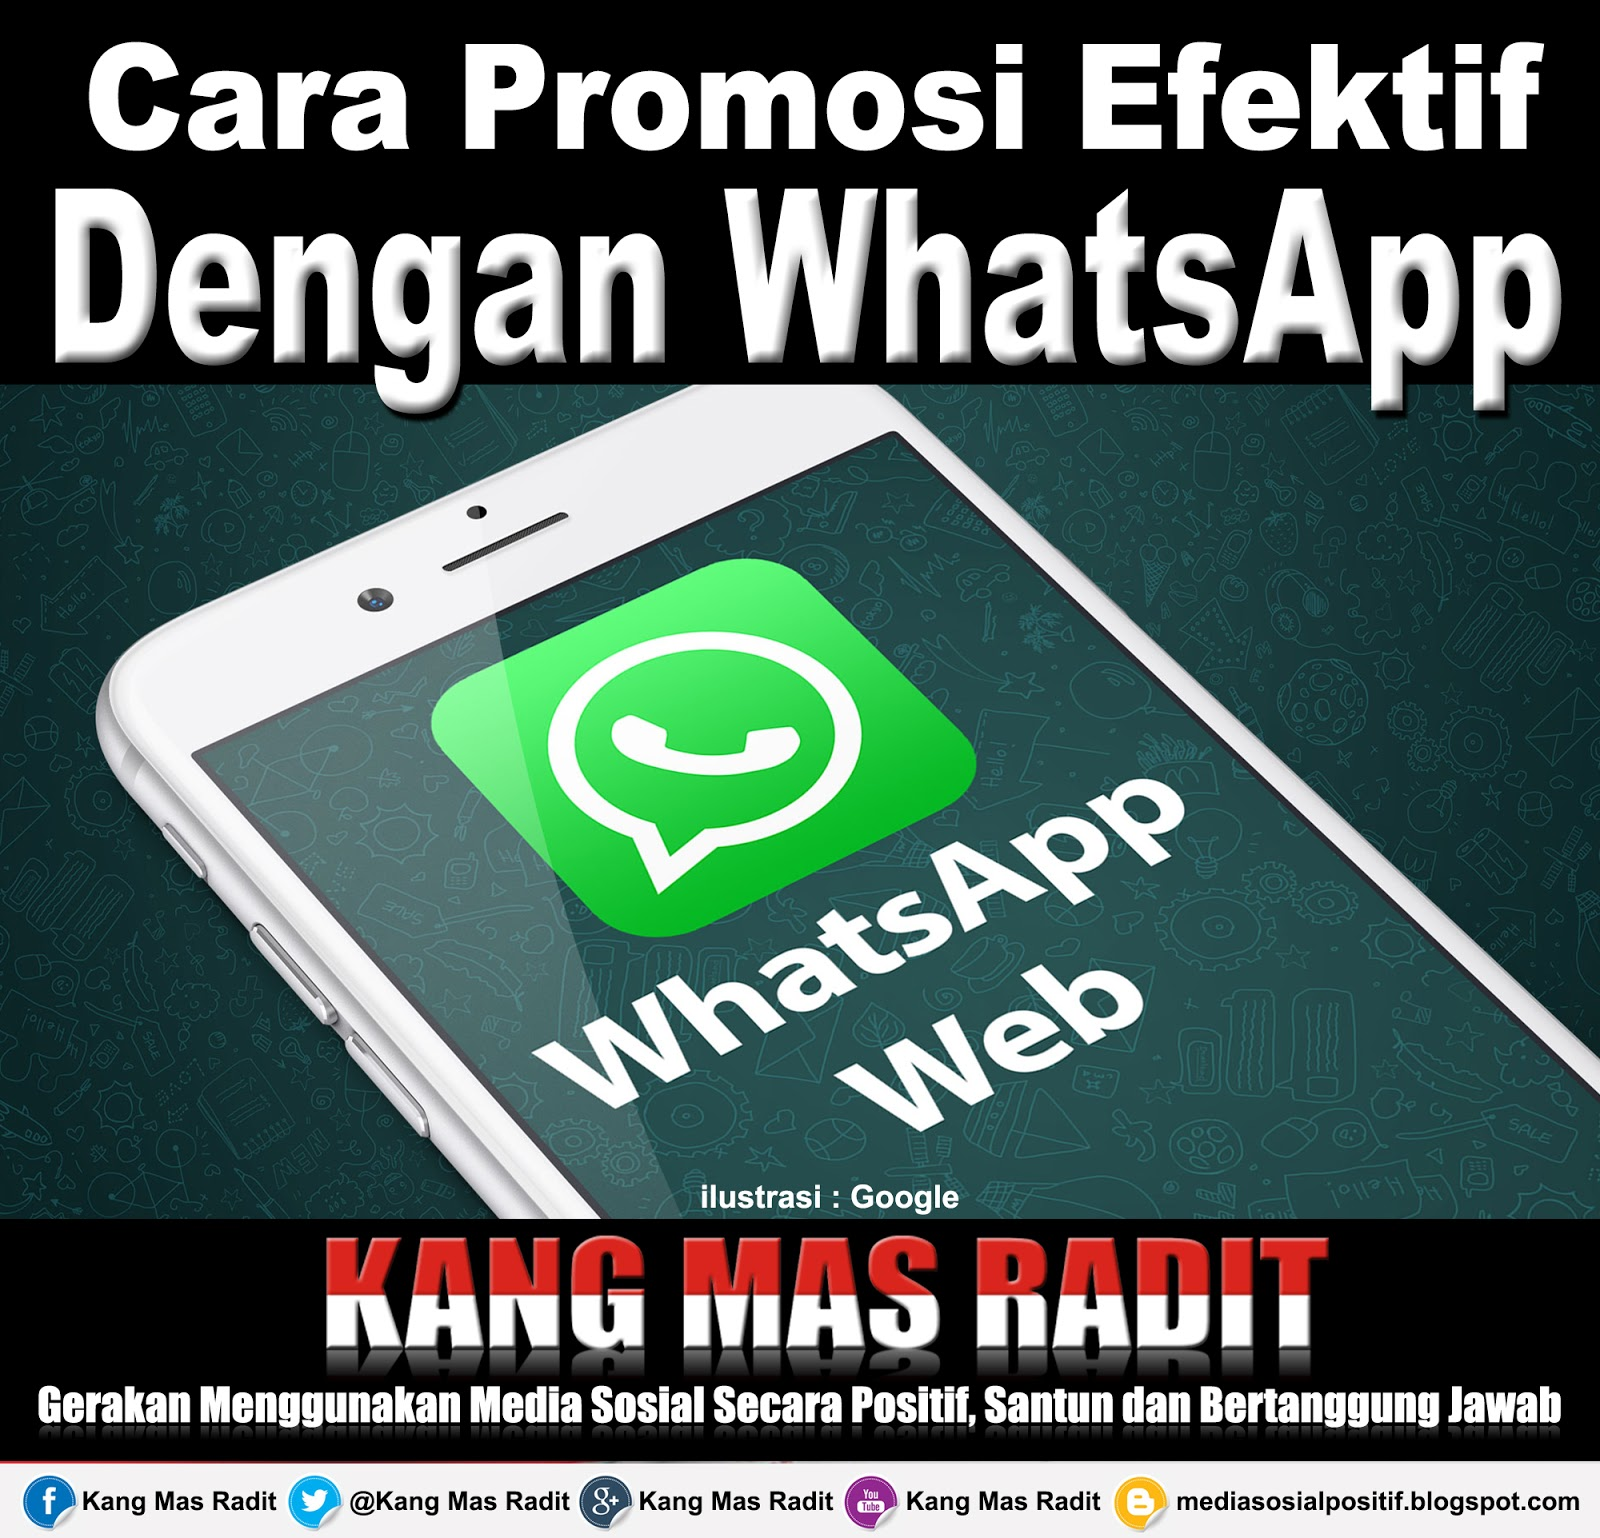 3 Cara Promosi Efektif Menggunakan WhatsApp Kang Mas Radit